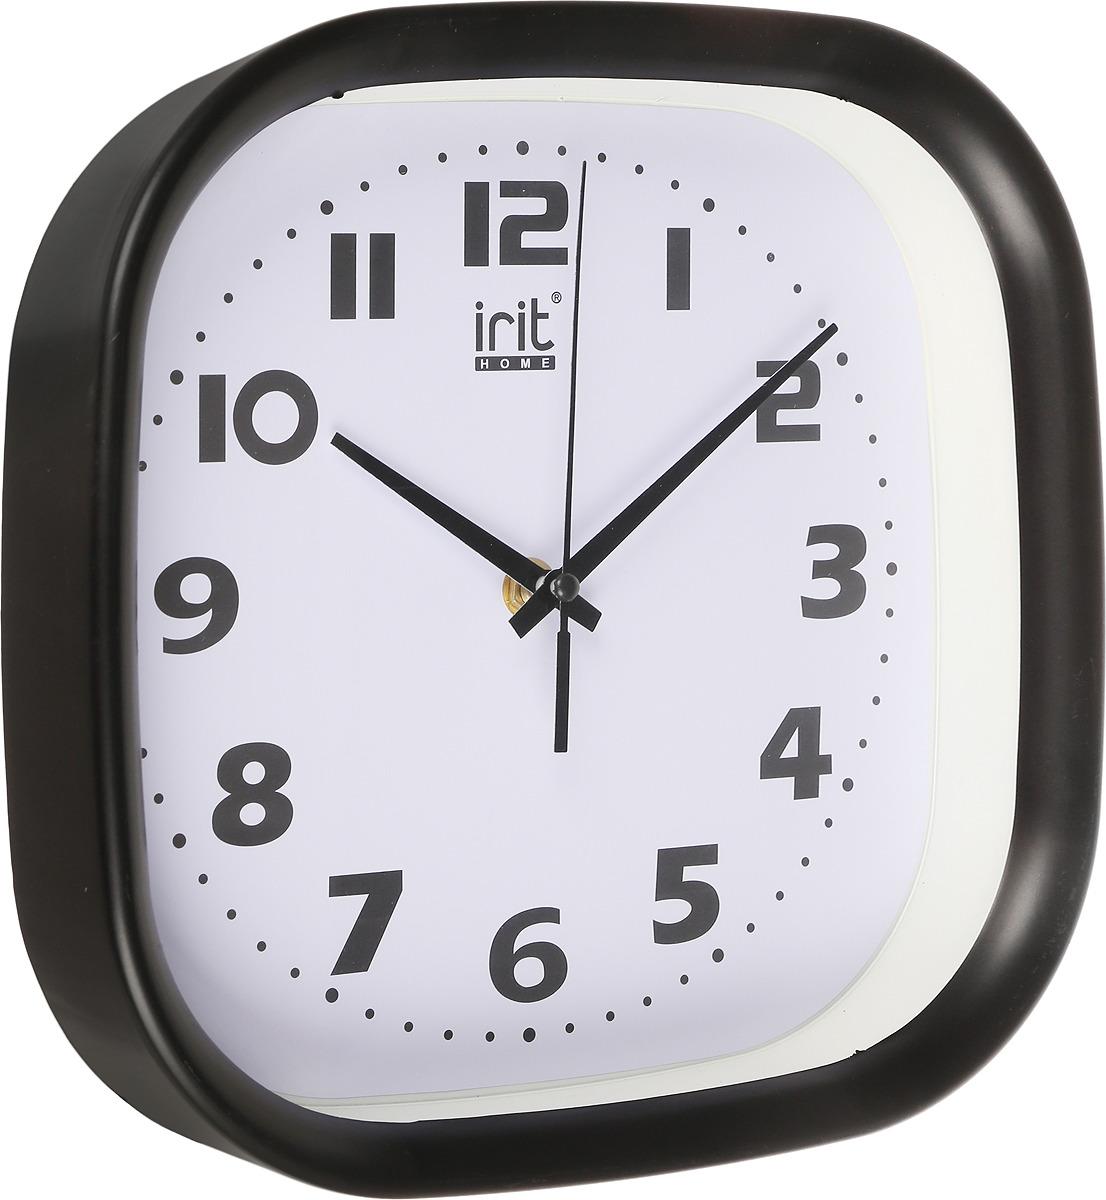 Настенные часы Irit IR-613, кварцевые, диаметр 30 см